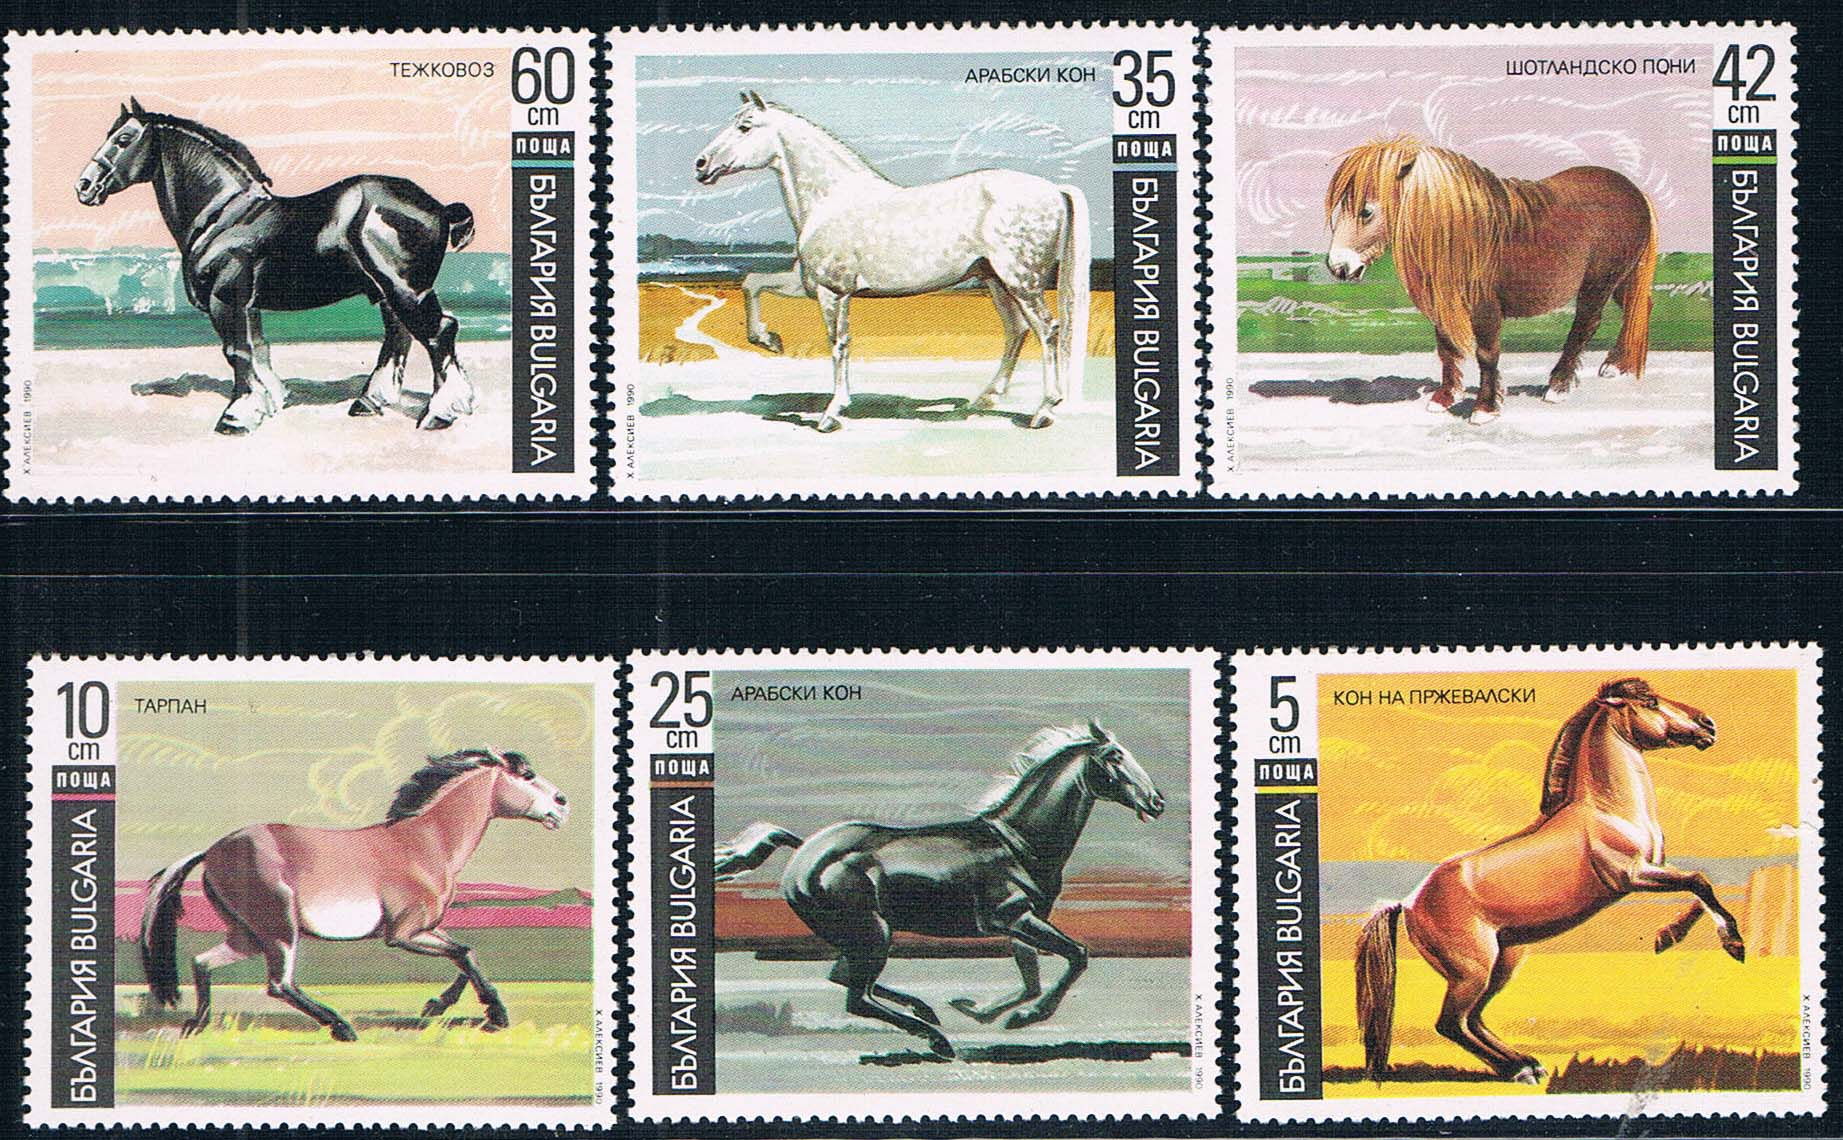 BG0105 6 new 0814 Bulgarian 1990 horses